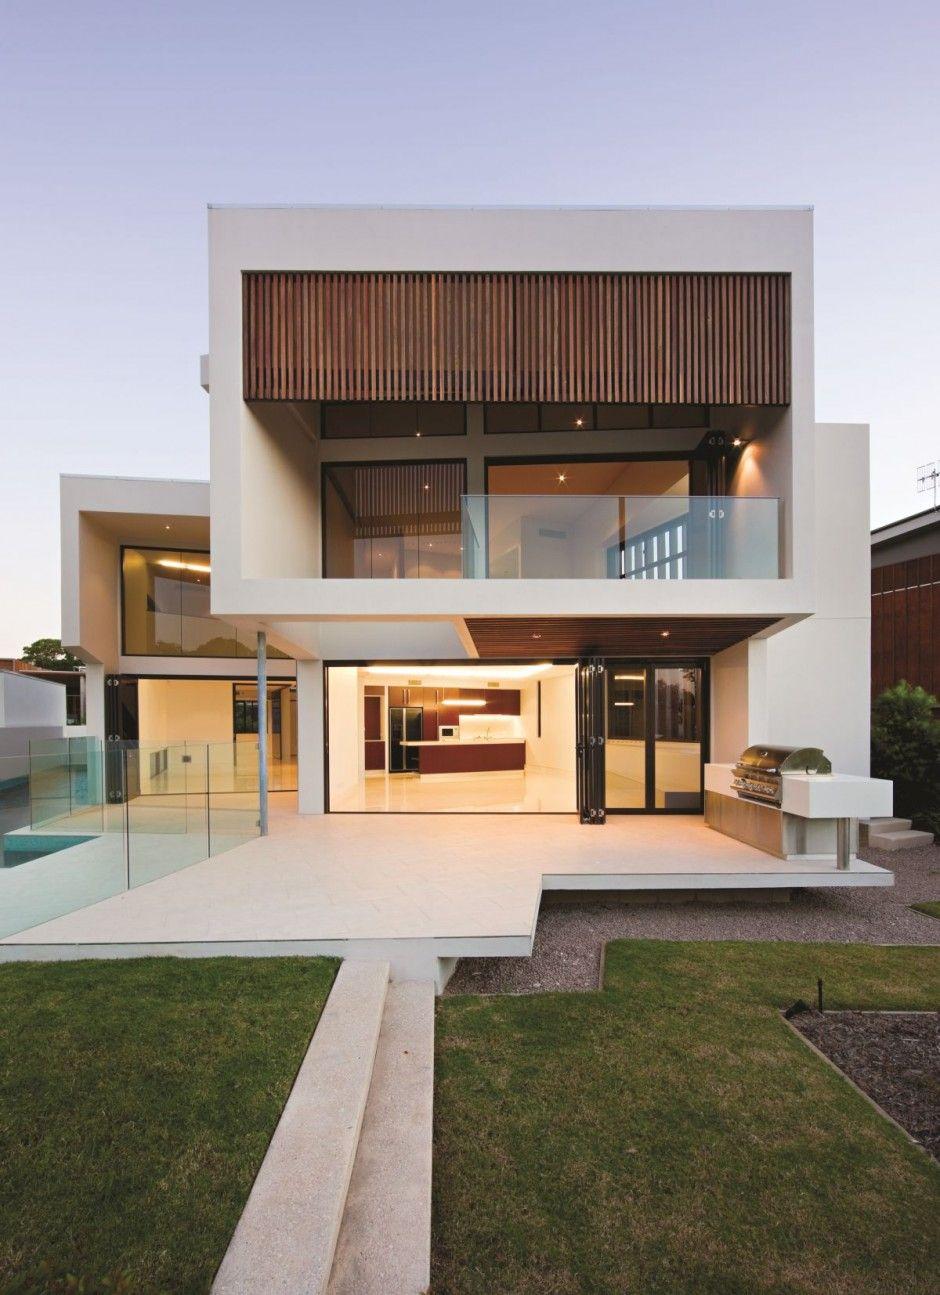 49 Most Popular Modern Dream House Exterior Design Ideas 3 In 2020: BVN #Architecture Have Designed The Elysium 154 House In Noosa, Queensland, Australia